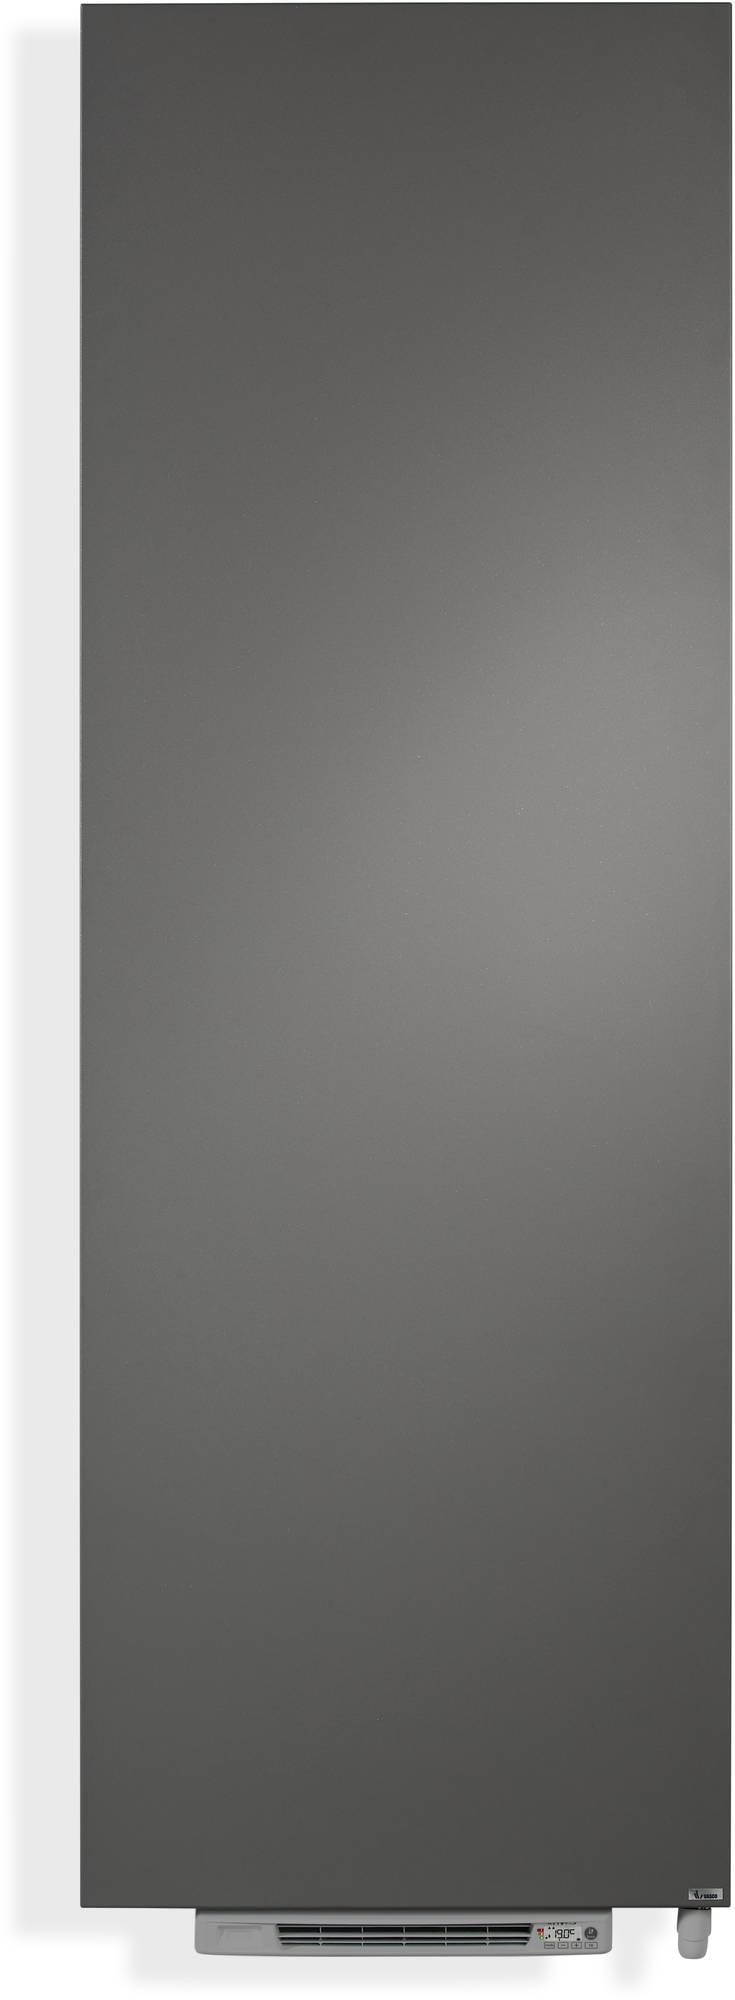 Vasco Niva N1L1-EL Blower elektrische radiator 183x62cm 2250W Grijs Aluminium